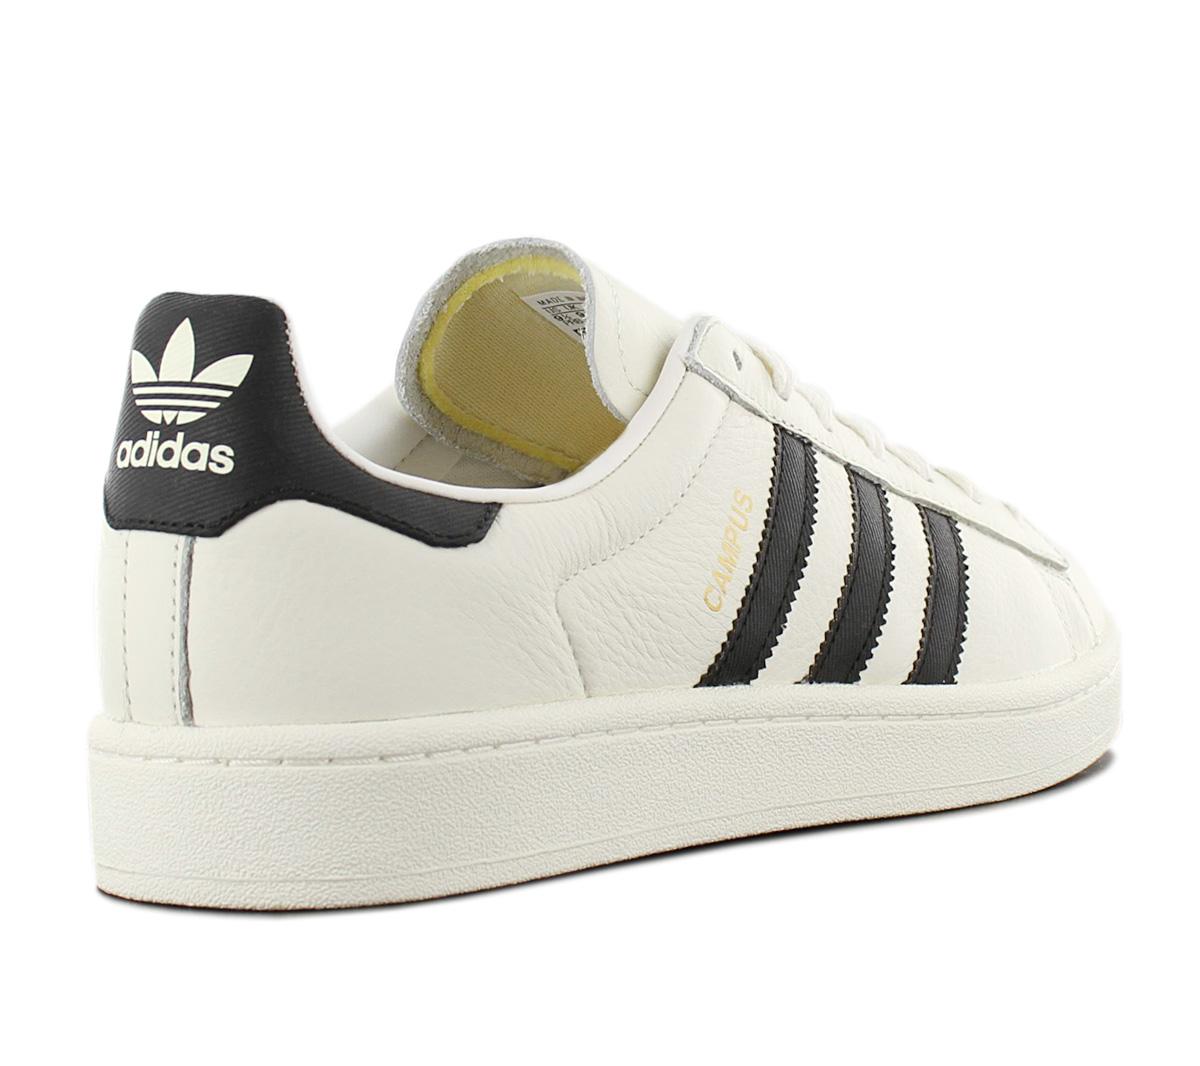 Details about Adidas Originals Campus Men's Sneaker CQ2070 Leather White Shoes Retro Trainers